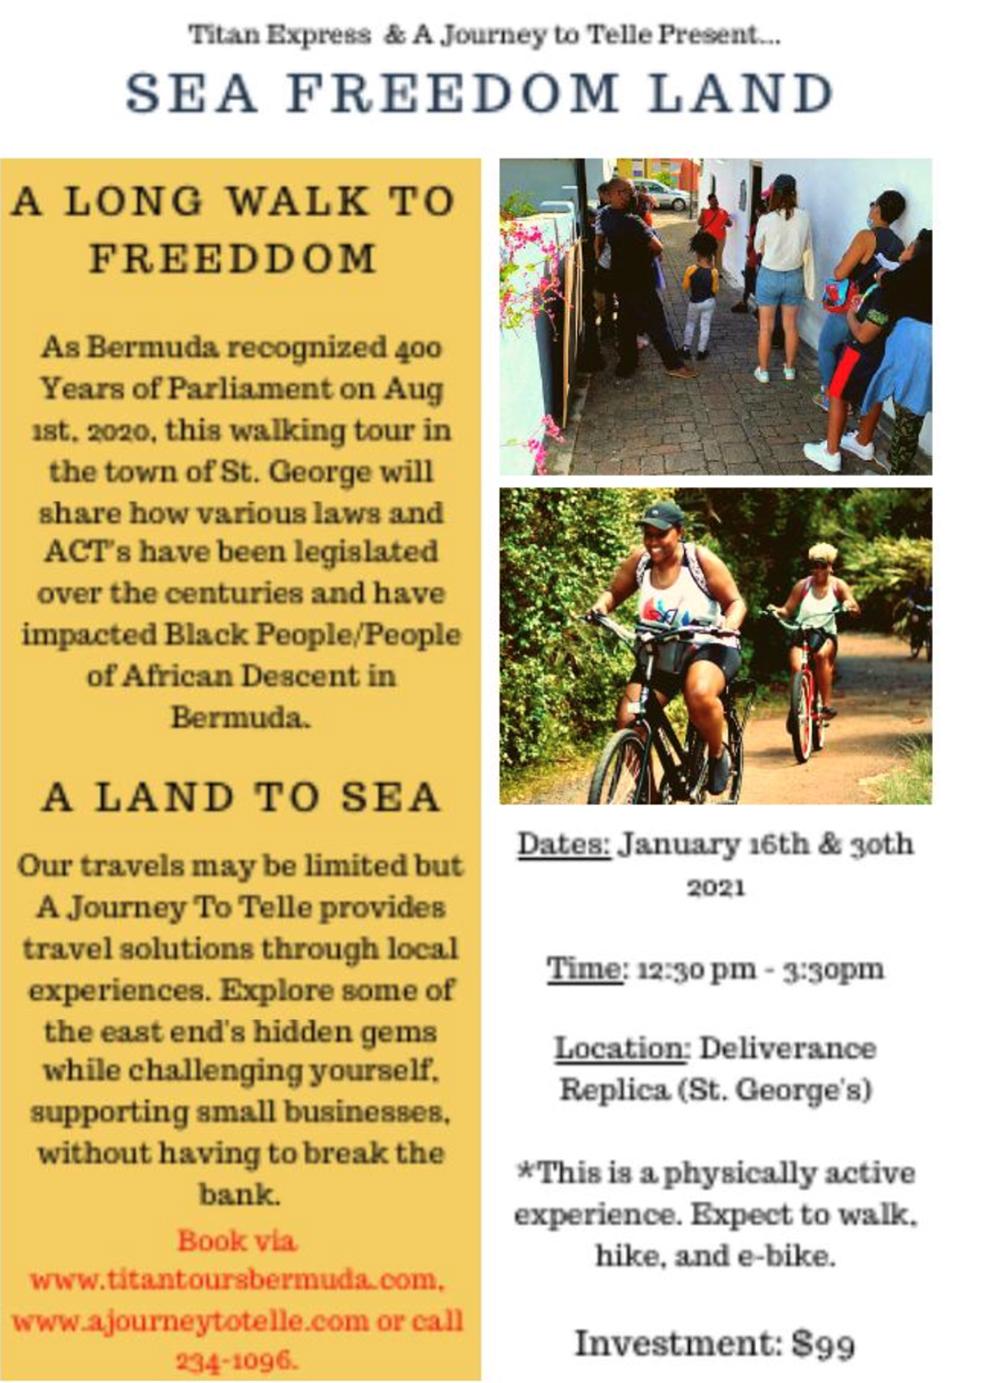 SEA FREEDOM LAND Bermuda Jan 9 2021